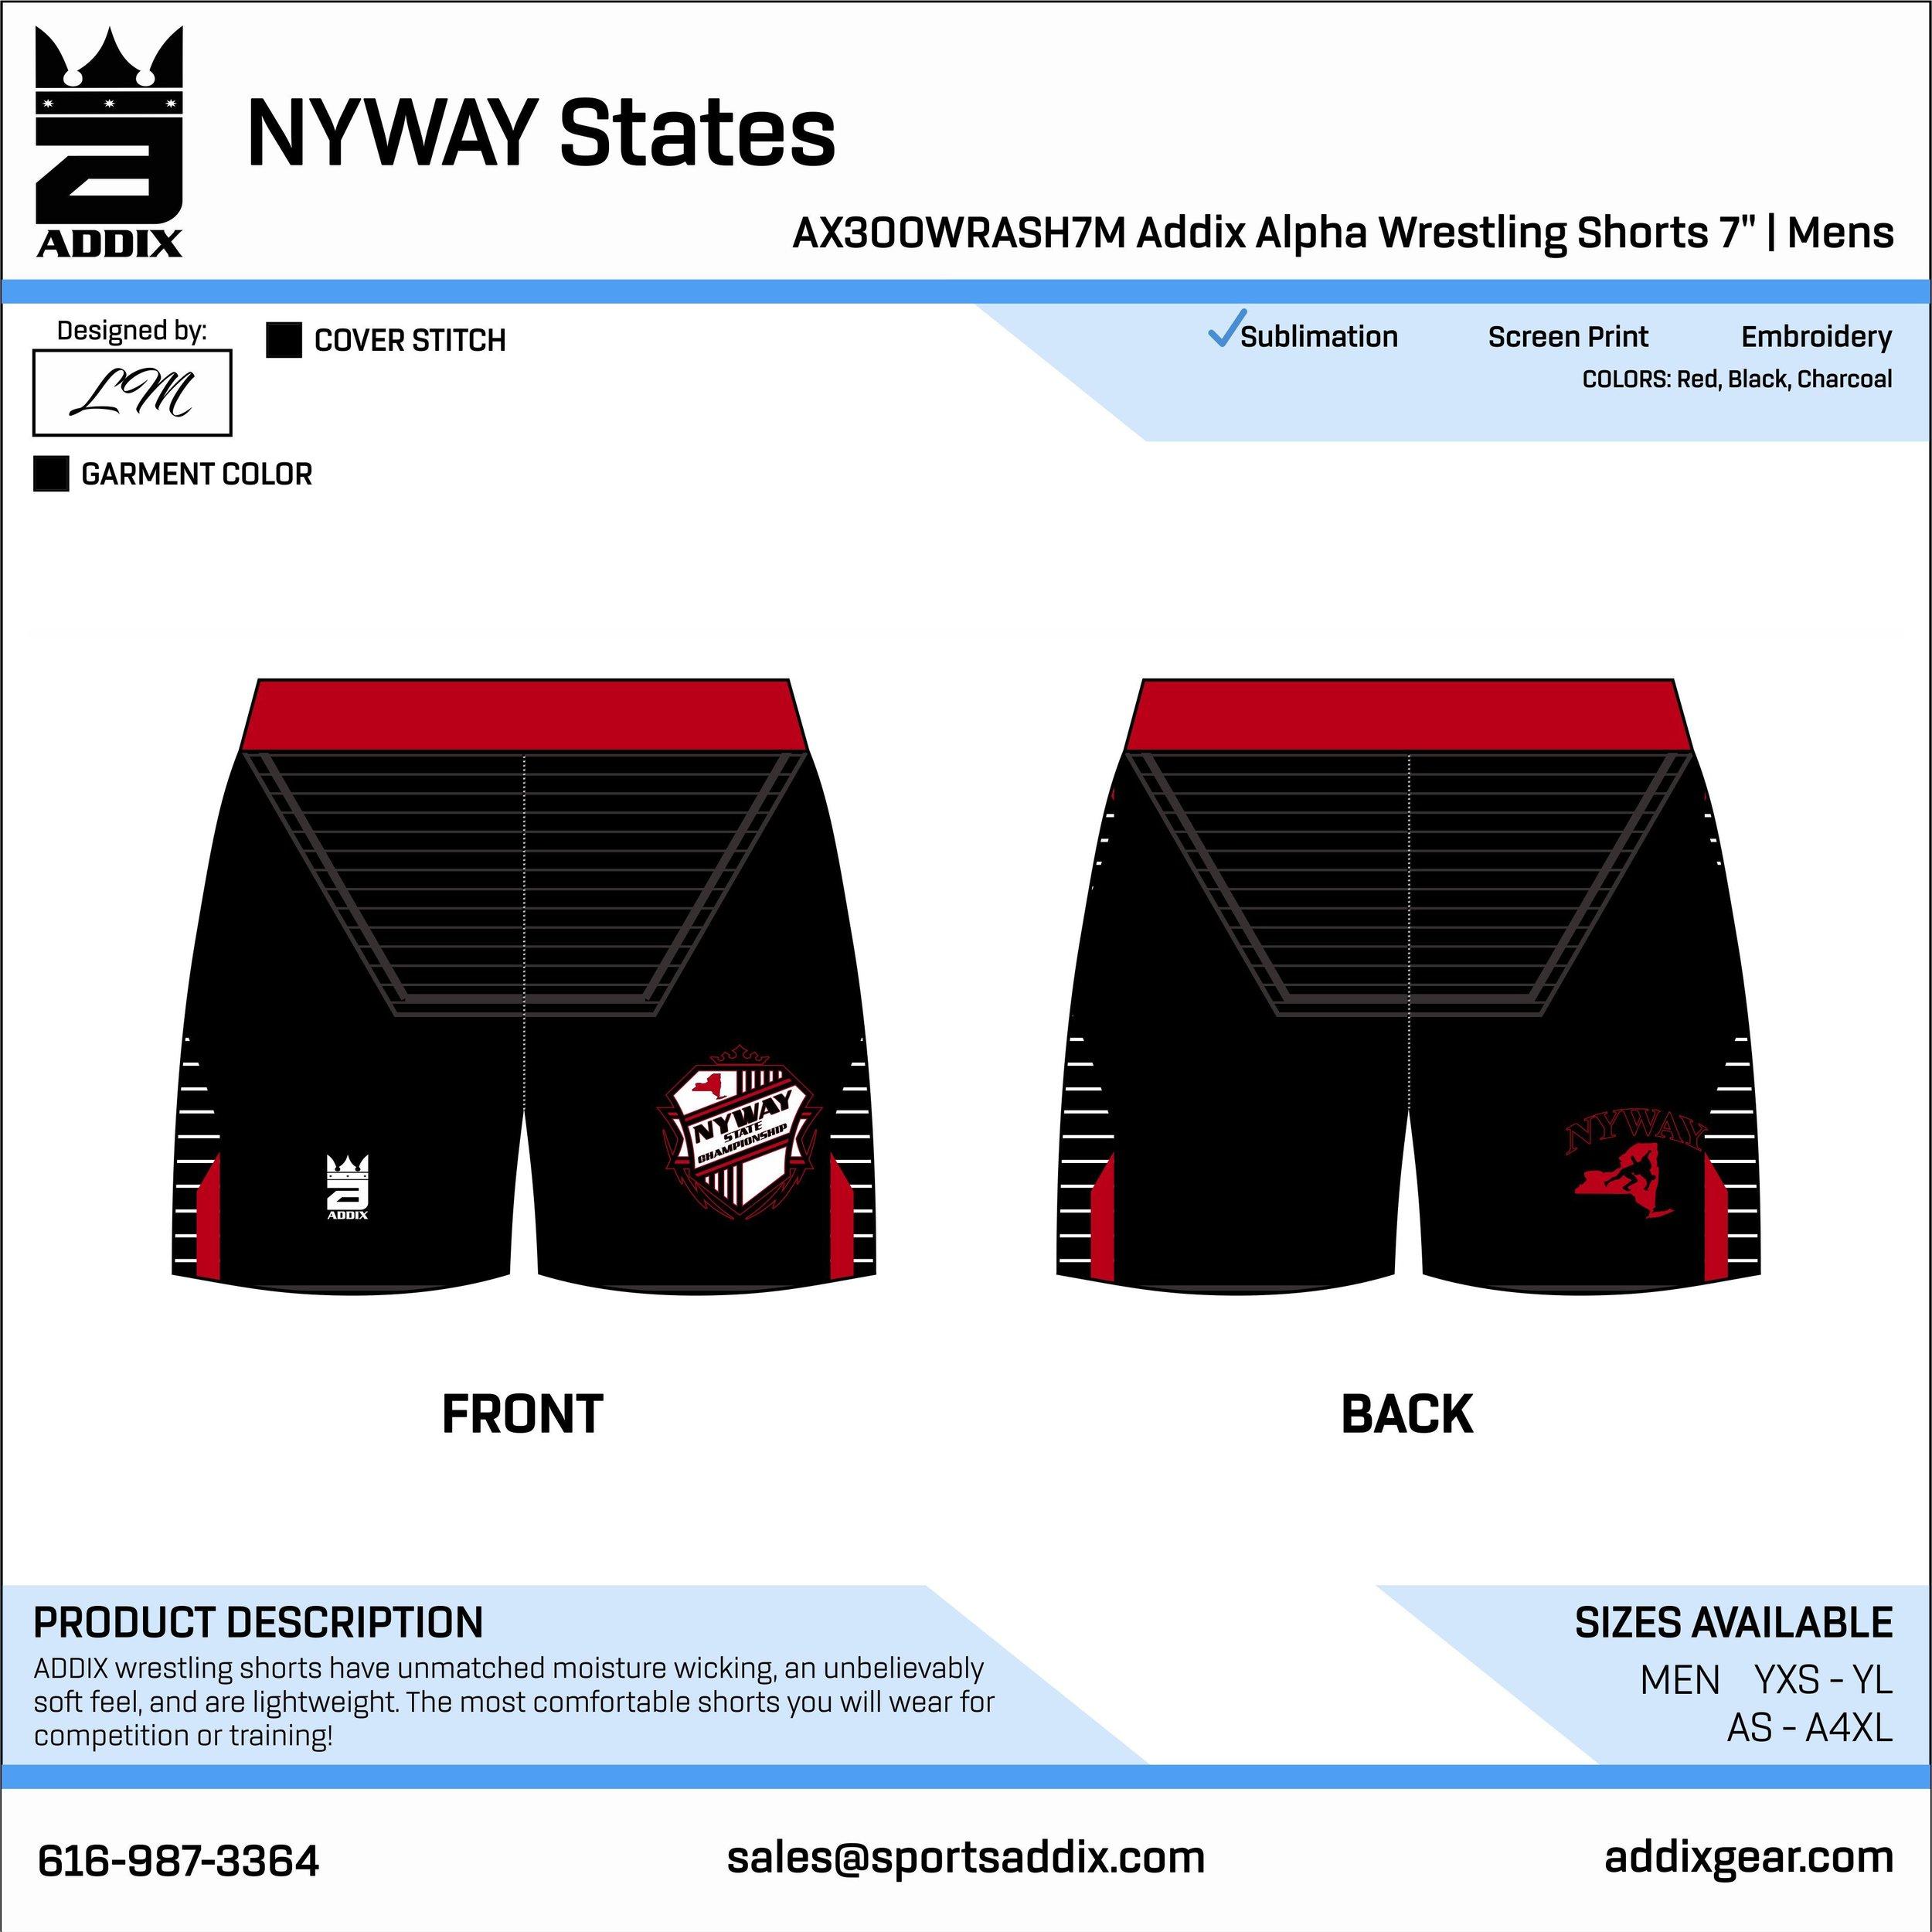 NYWAY States_2019_2-12_LM_shortsblack.jpg